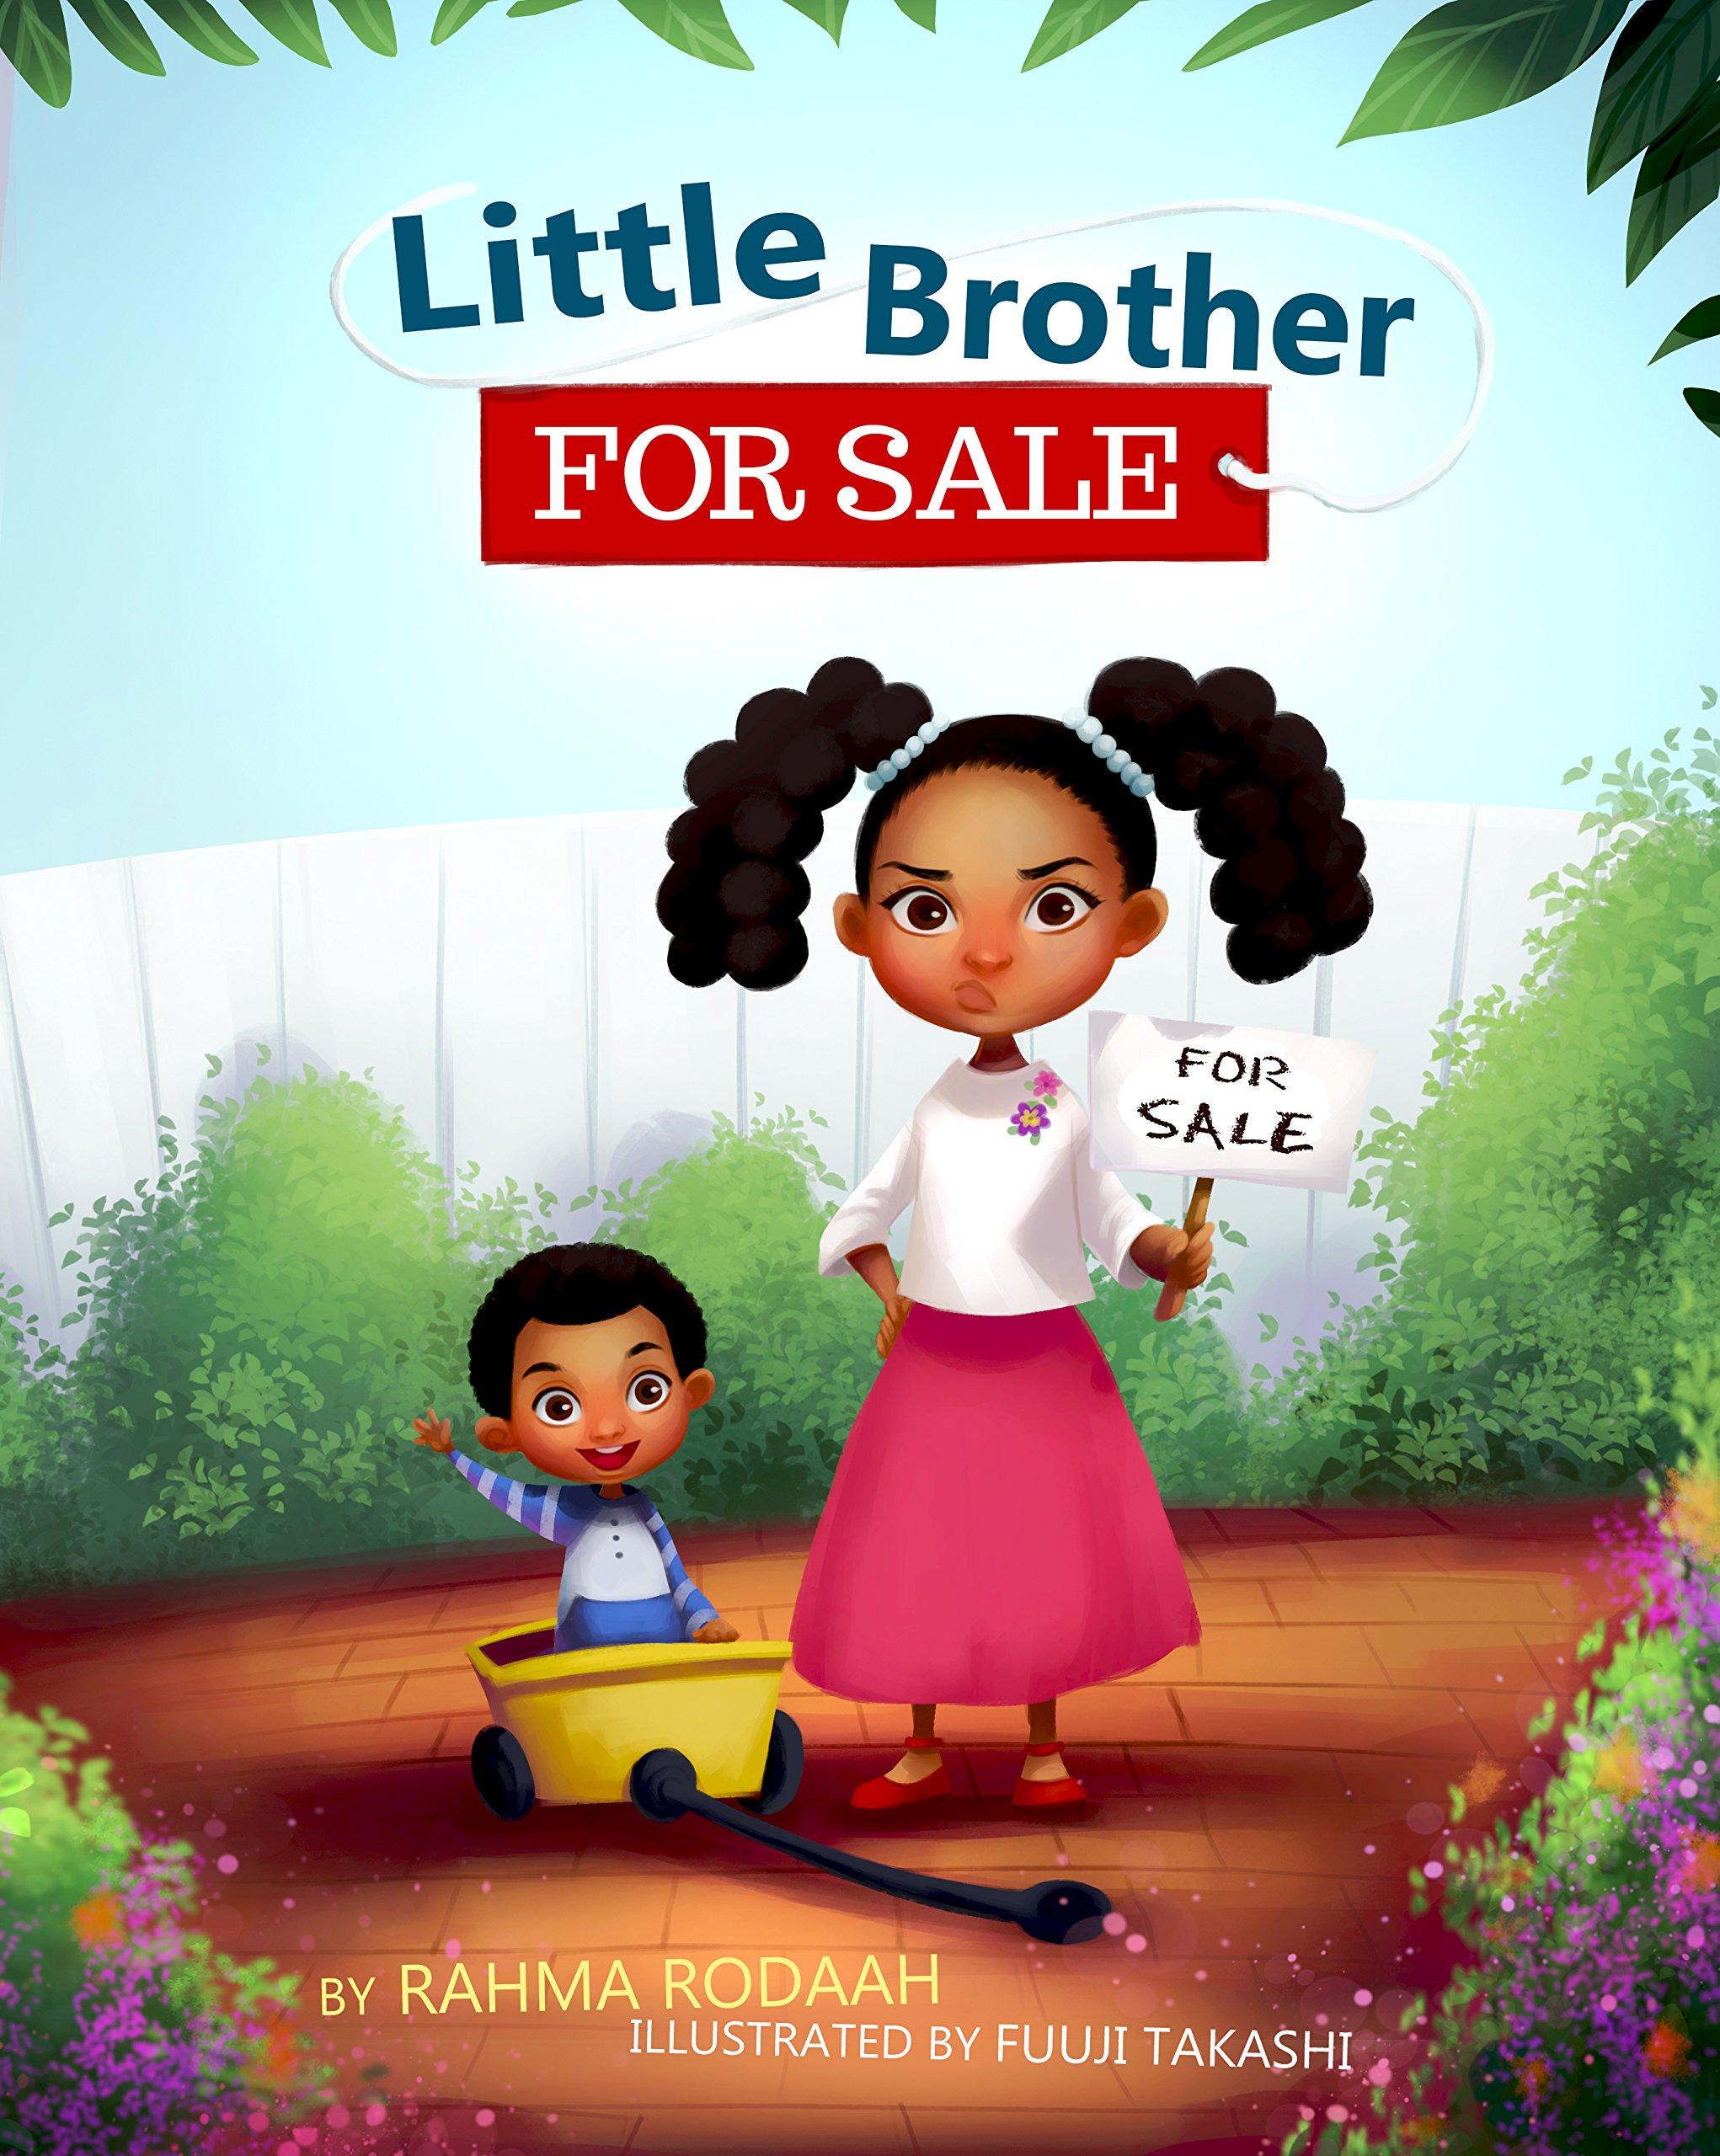 80bca0ee2fc7 Little Brother for Sale  Rahma Rodaah  9780995922938  Amazon.com  Books